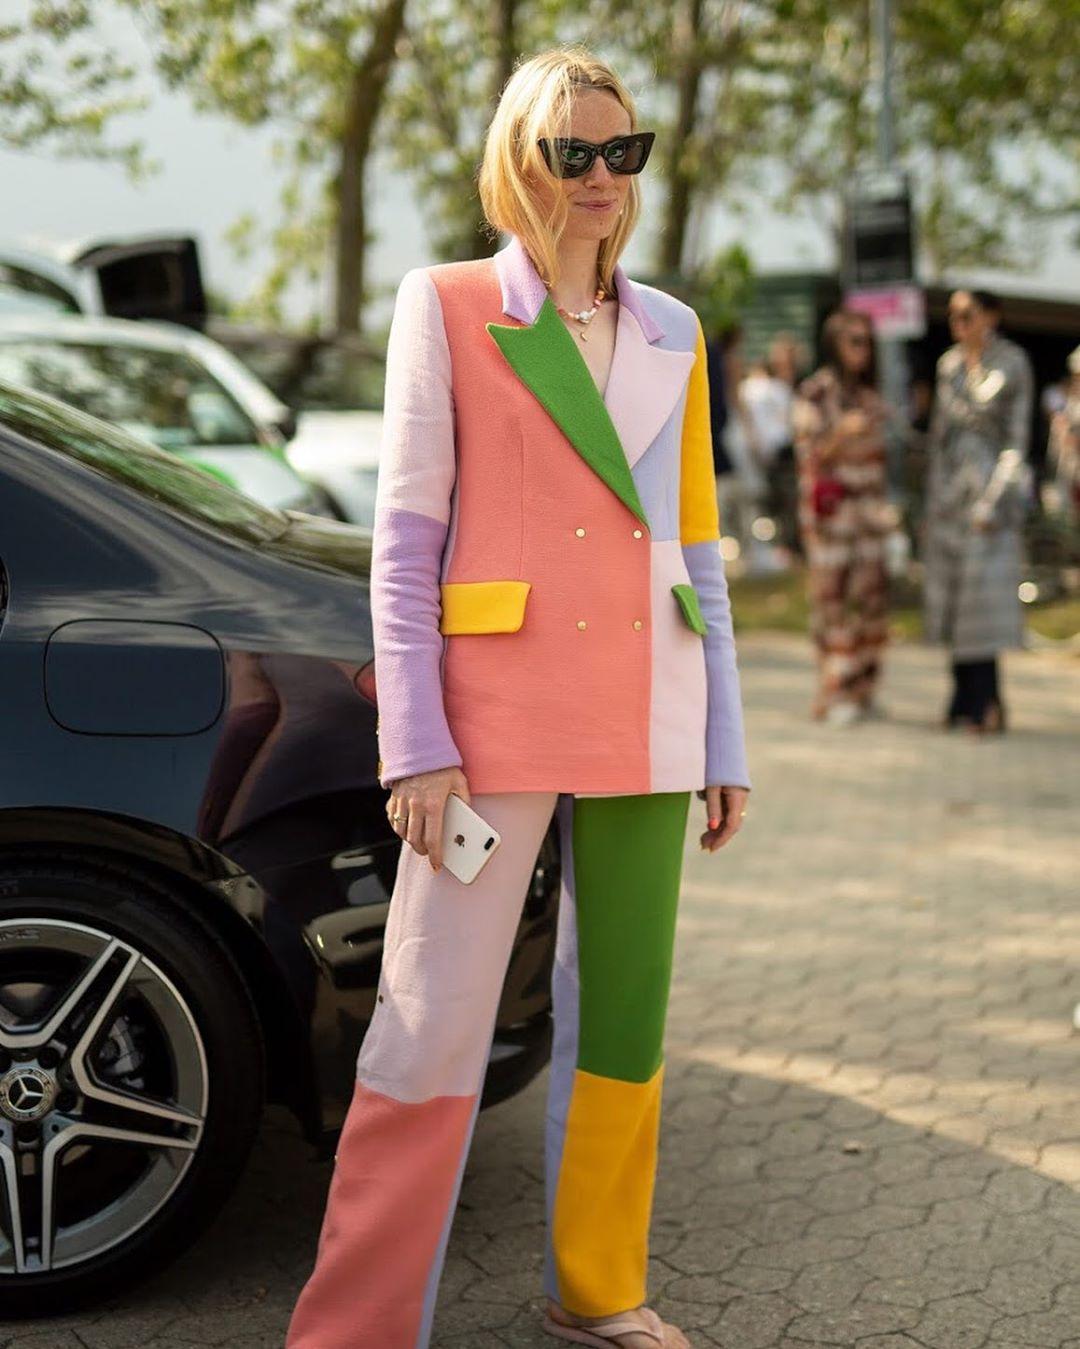 Cách phối đồ suit đa sắc màu